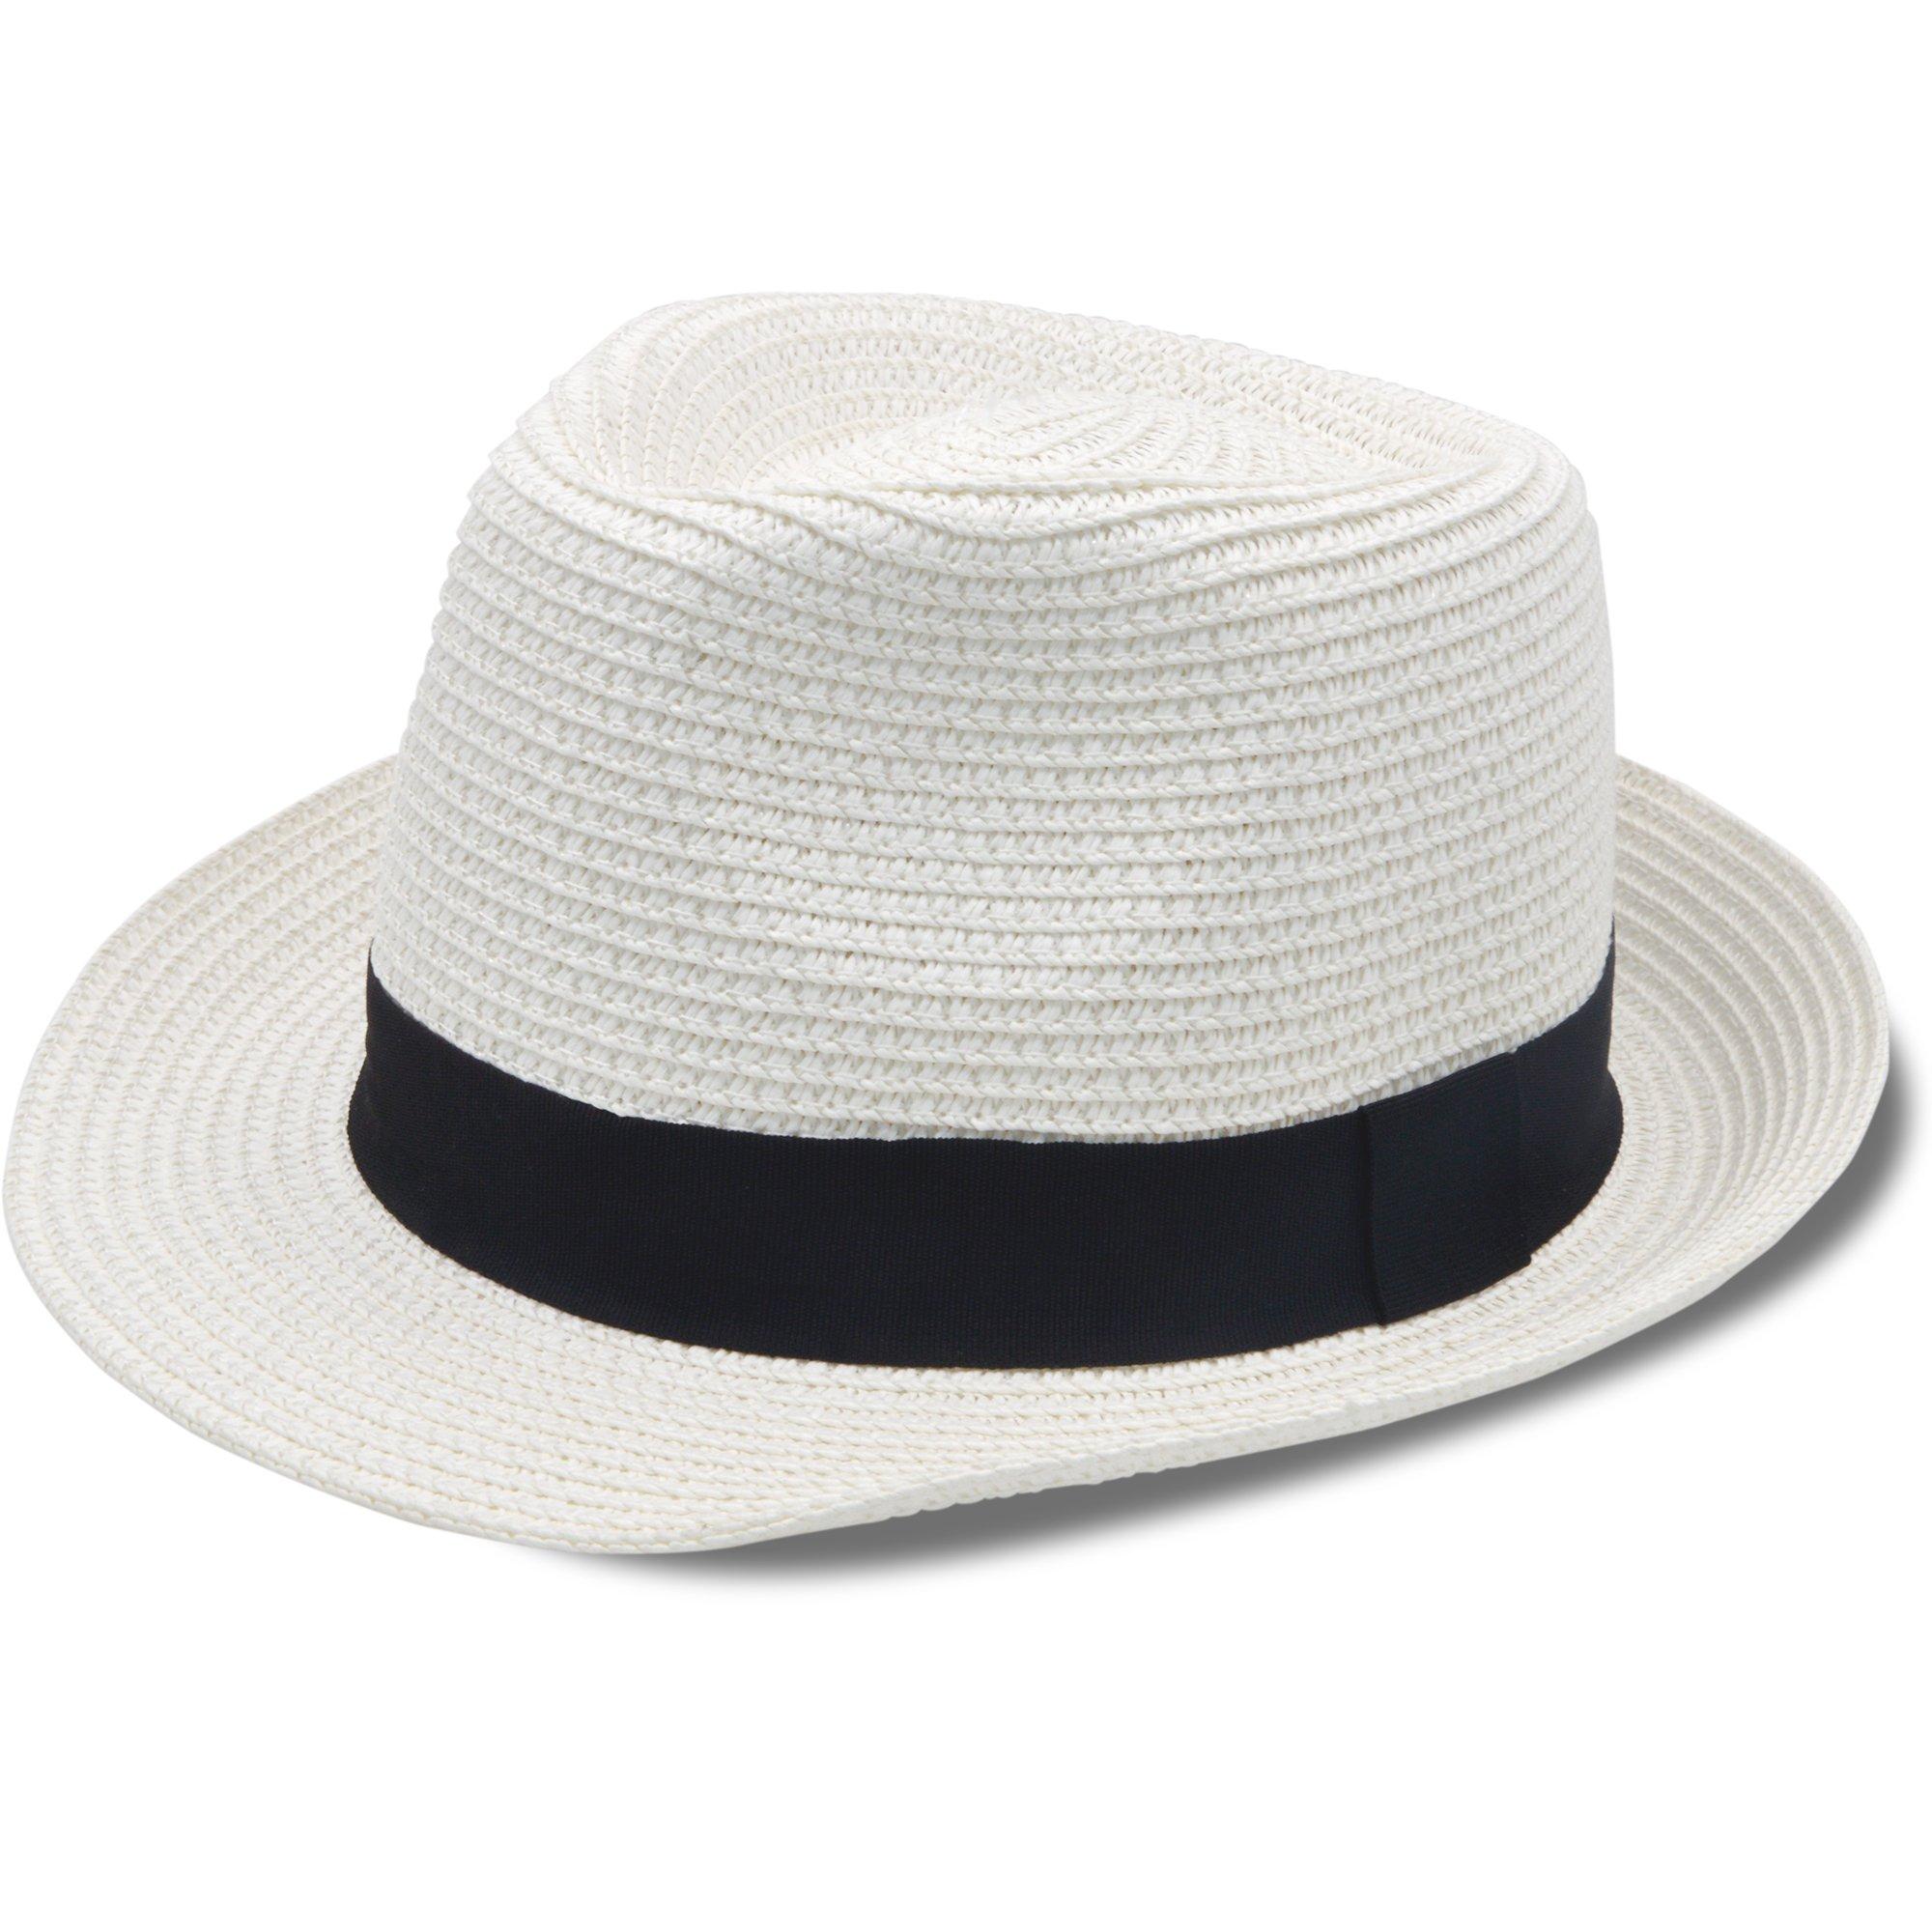 Stynice Panama Hat Foldable Fedora Hats for Women & Men Short Brim Straw Hats Beach Sun Hat for Summer Vacation Jazz 55-58cm